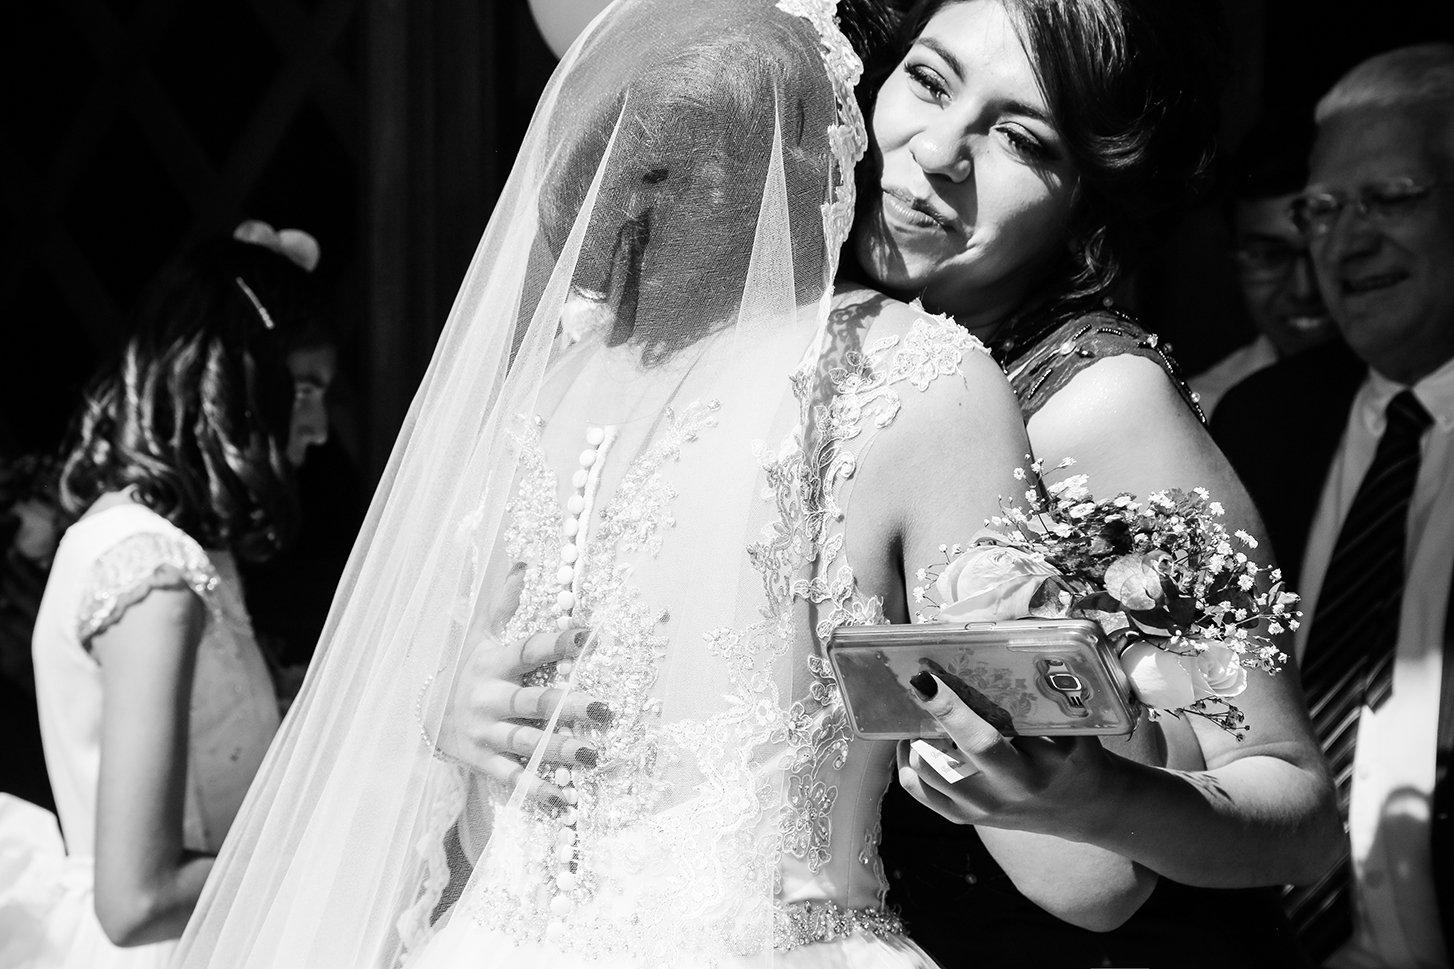 Maroge-Angela-Velazquez-fotografia-boda-62